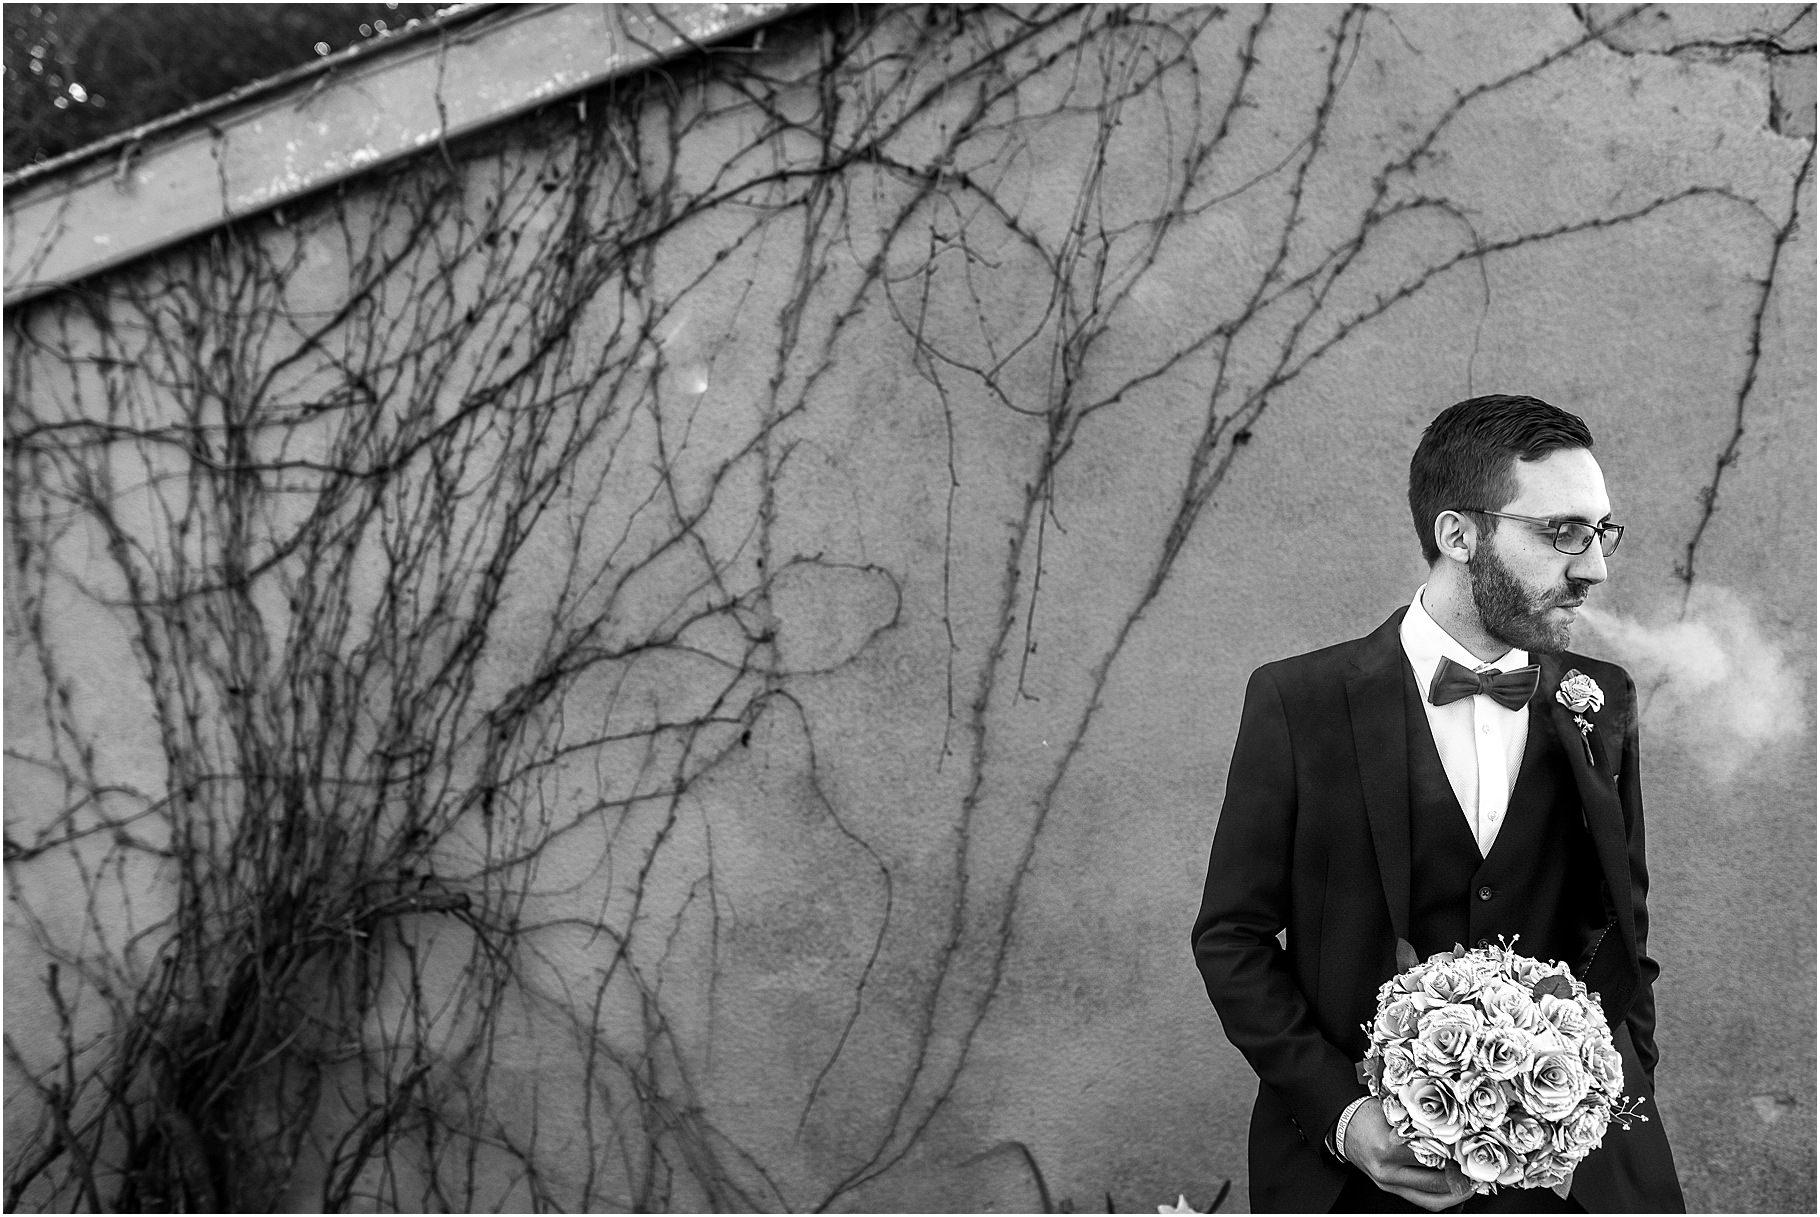 dan-wootton-photography-2017-weddings-039.jpg